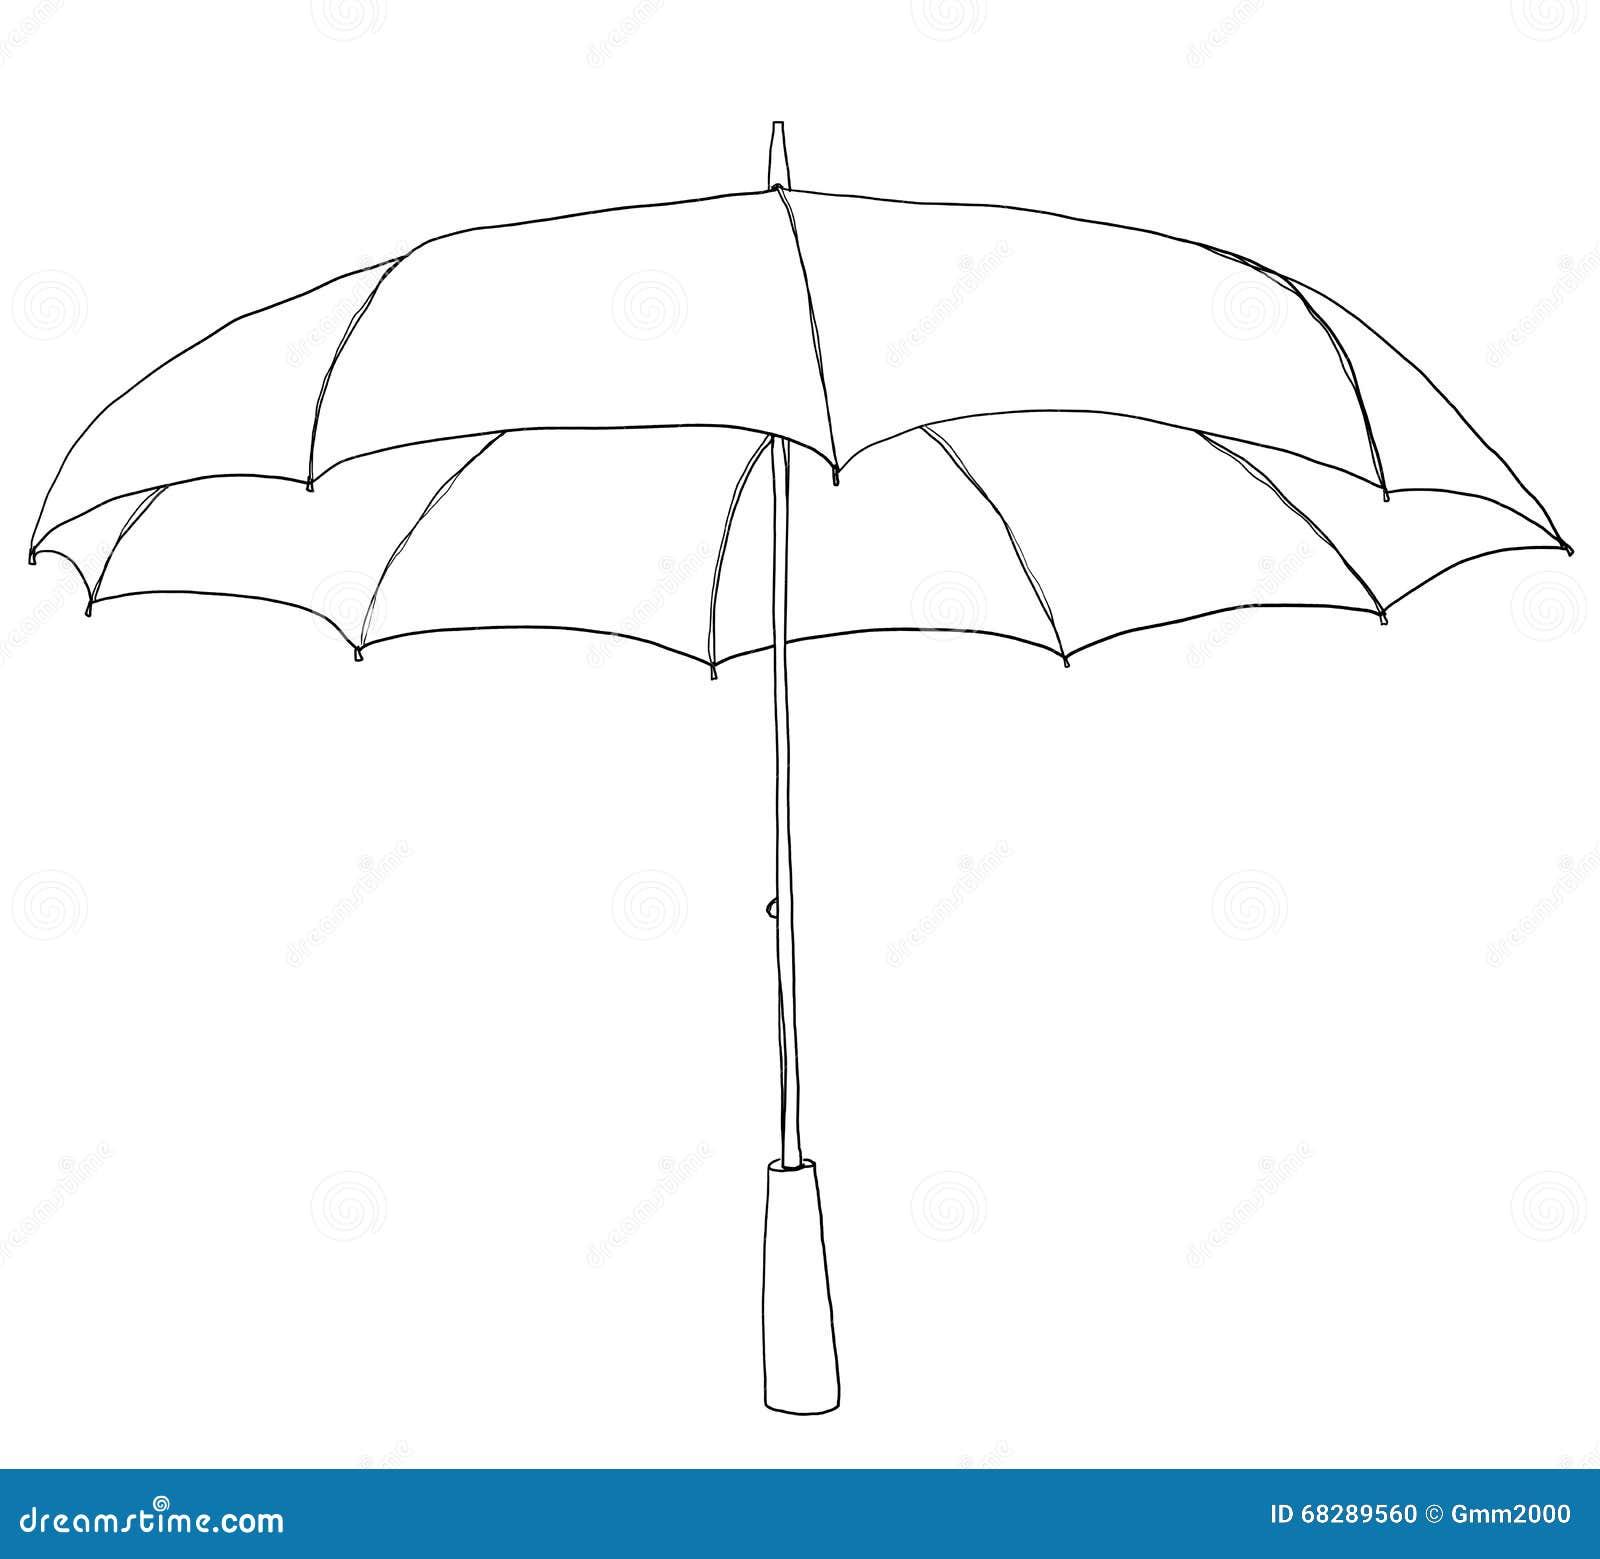 Line Art Umbrella : Monsoon cartoons illustrations vector stock images